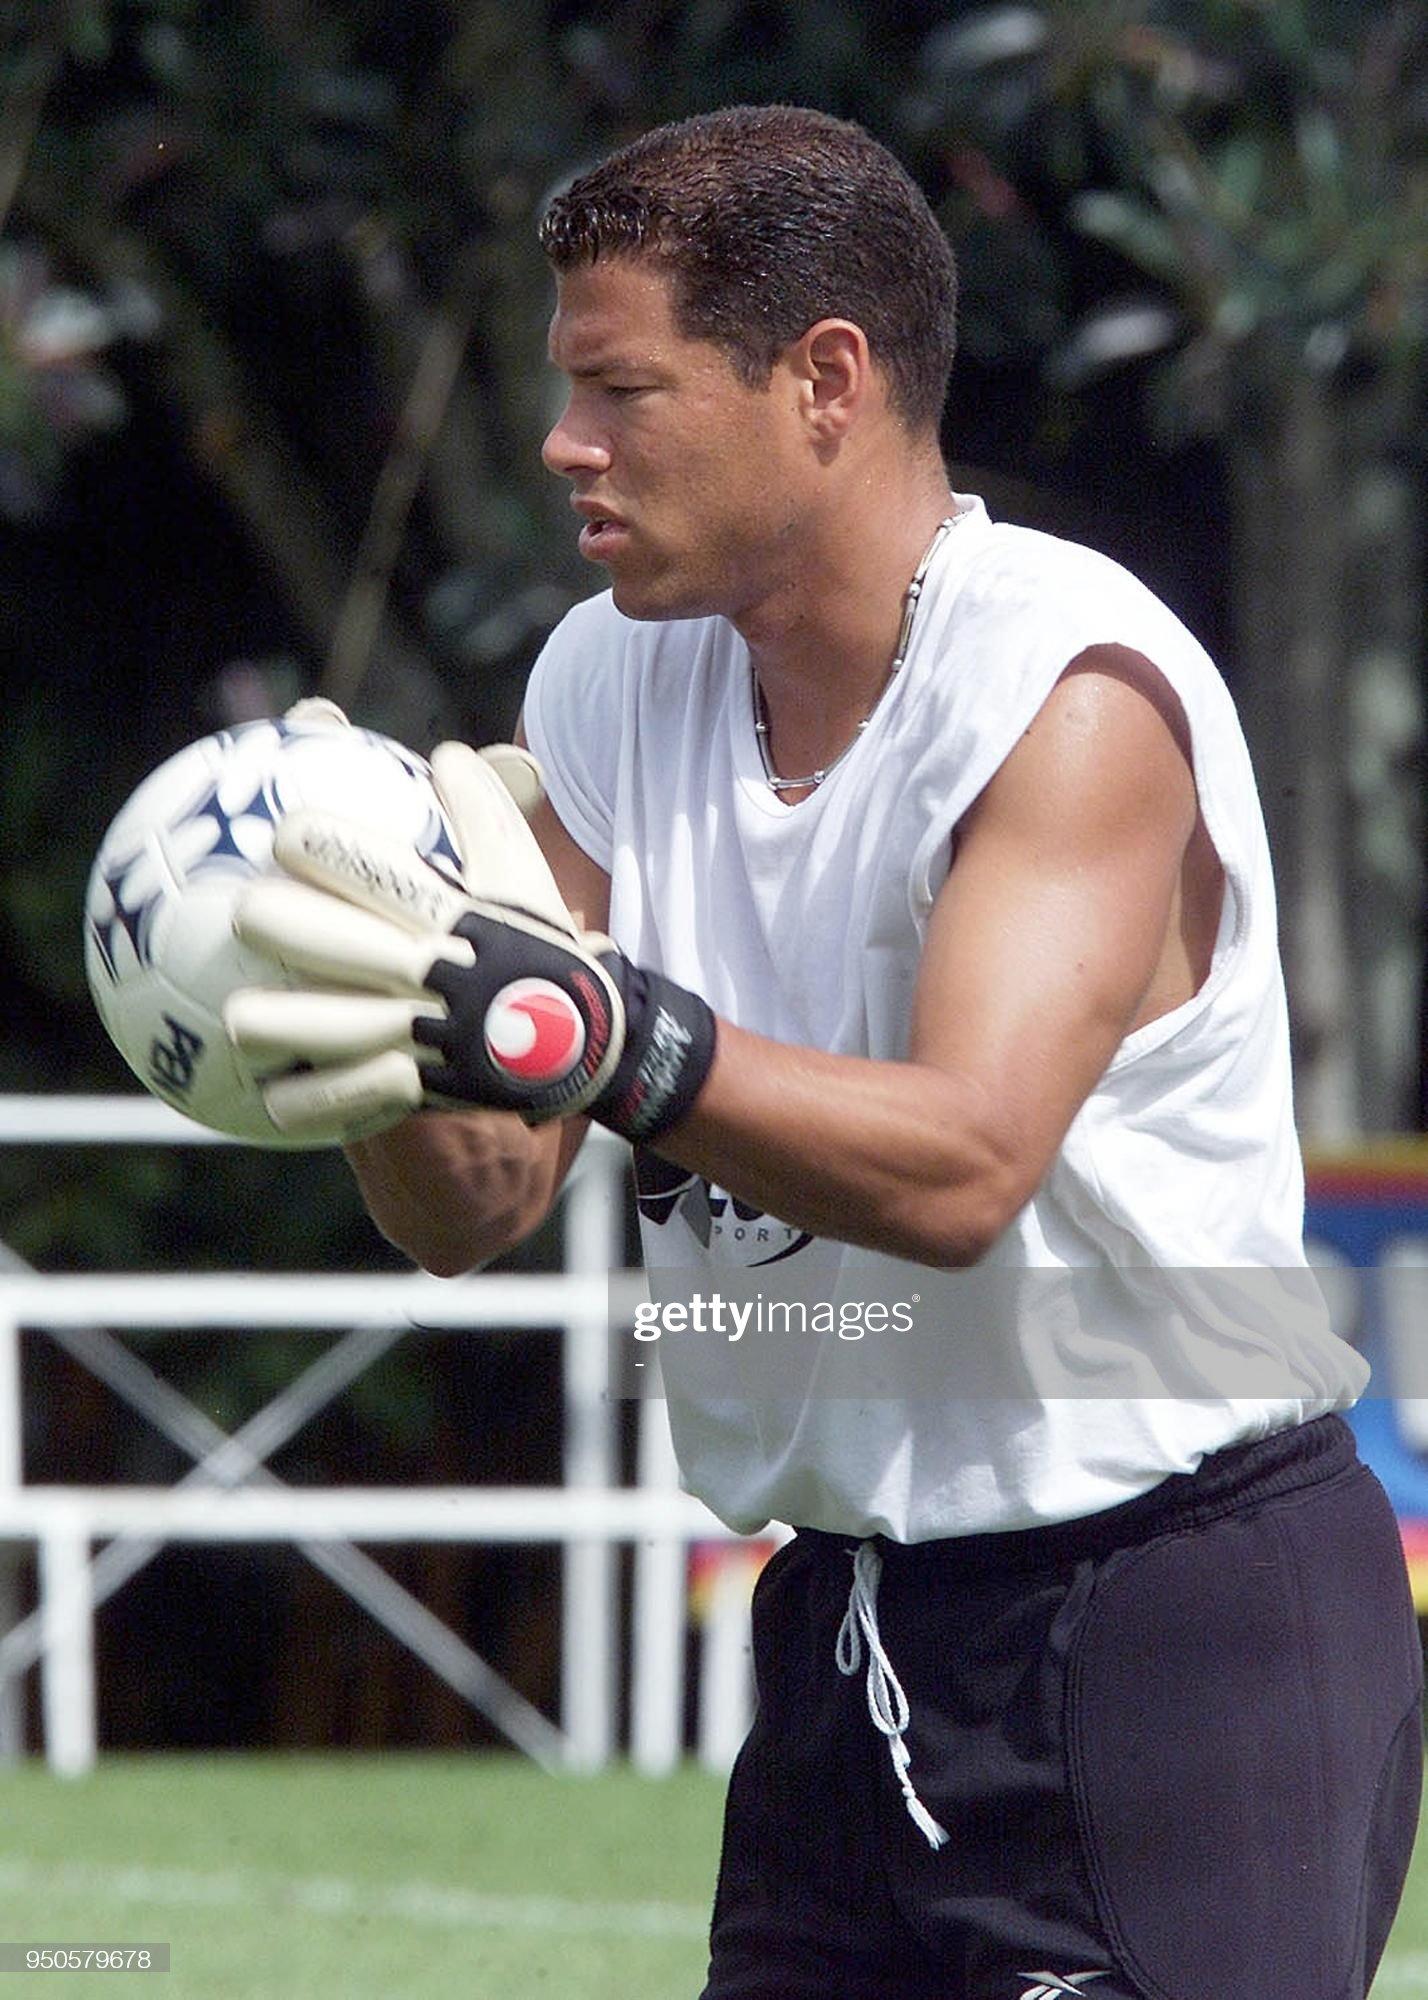 [Imagen: colombian-goalkeeper-oscar-cordoba-catch...=2048x2048]